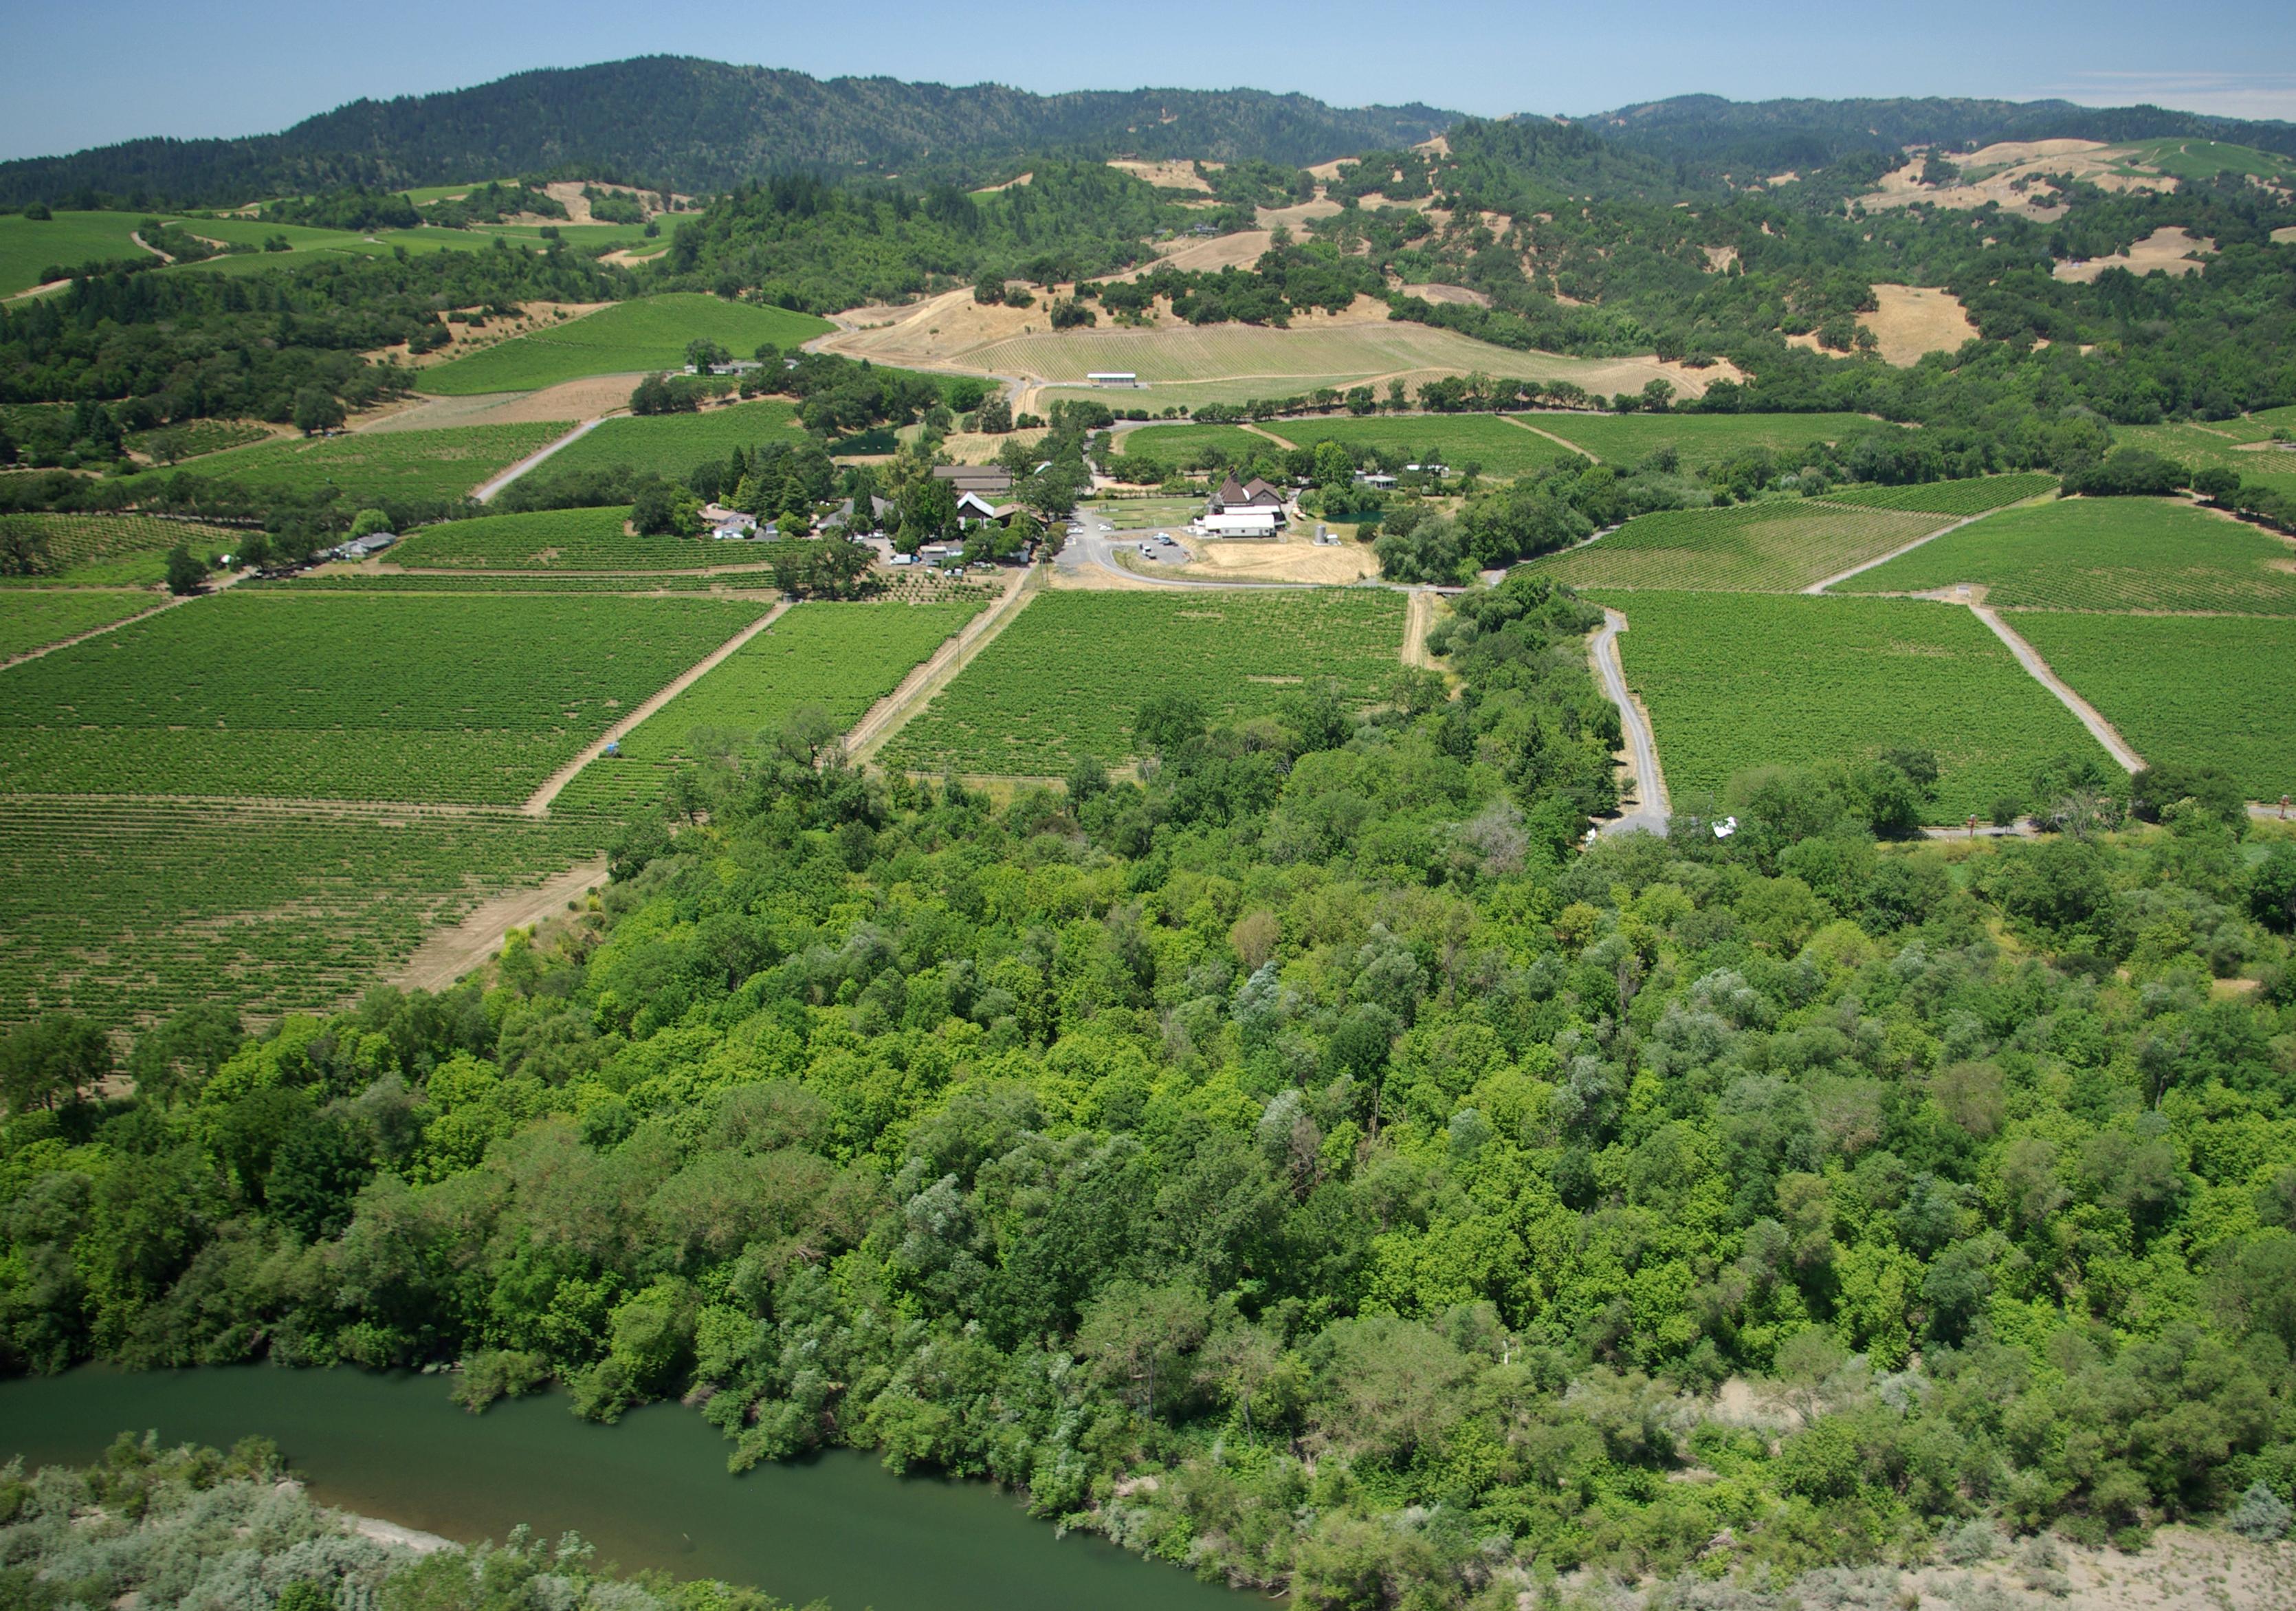 Russian River Valley in Sonoma County, California